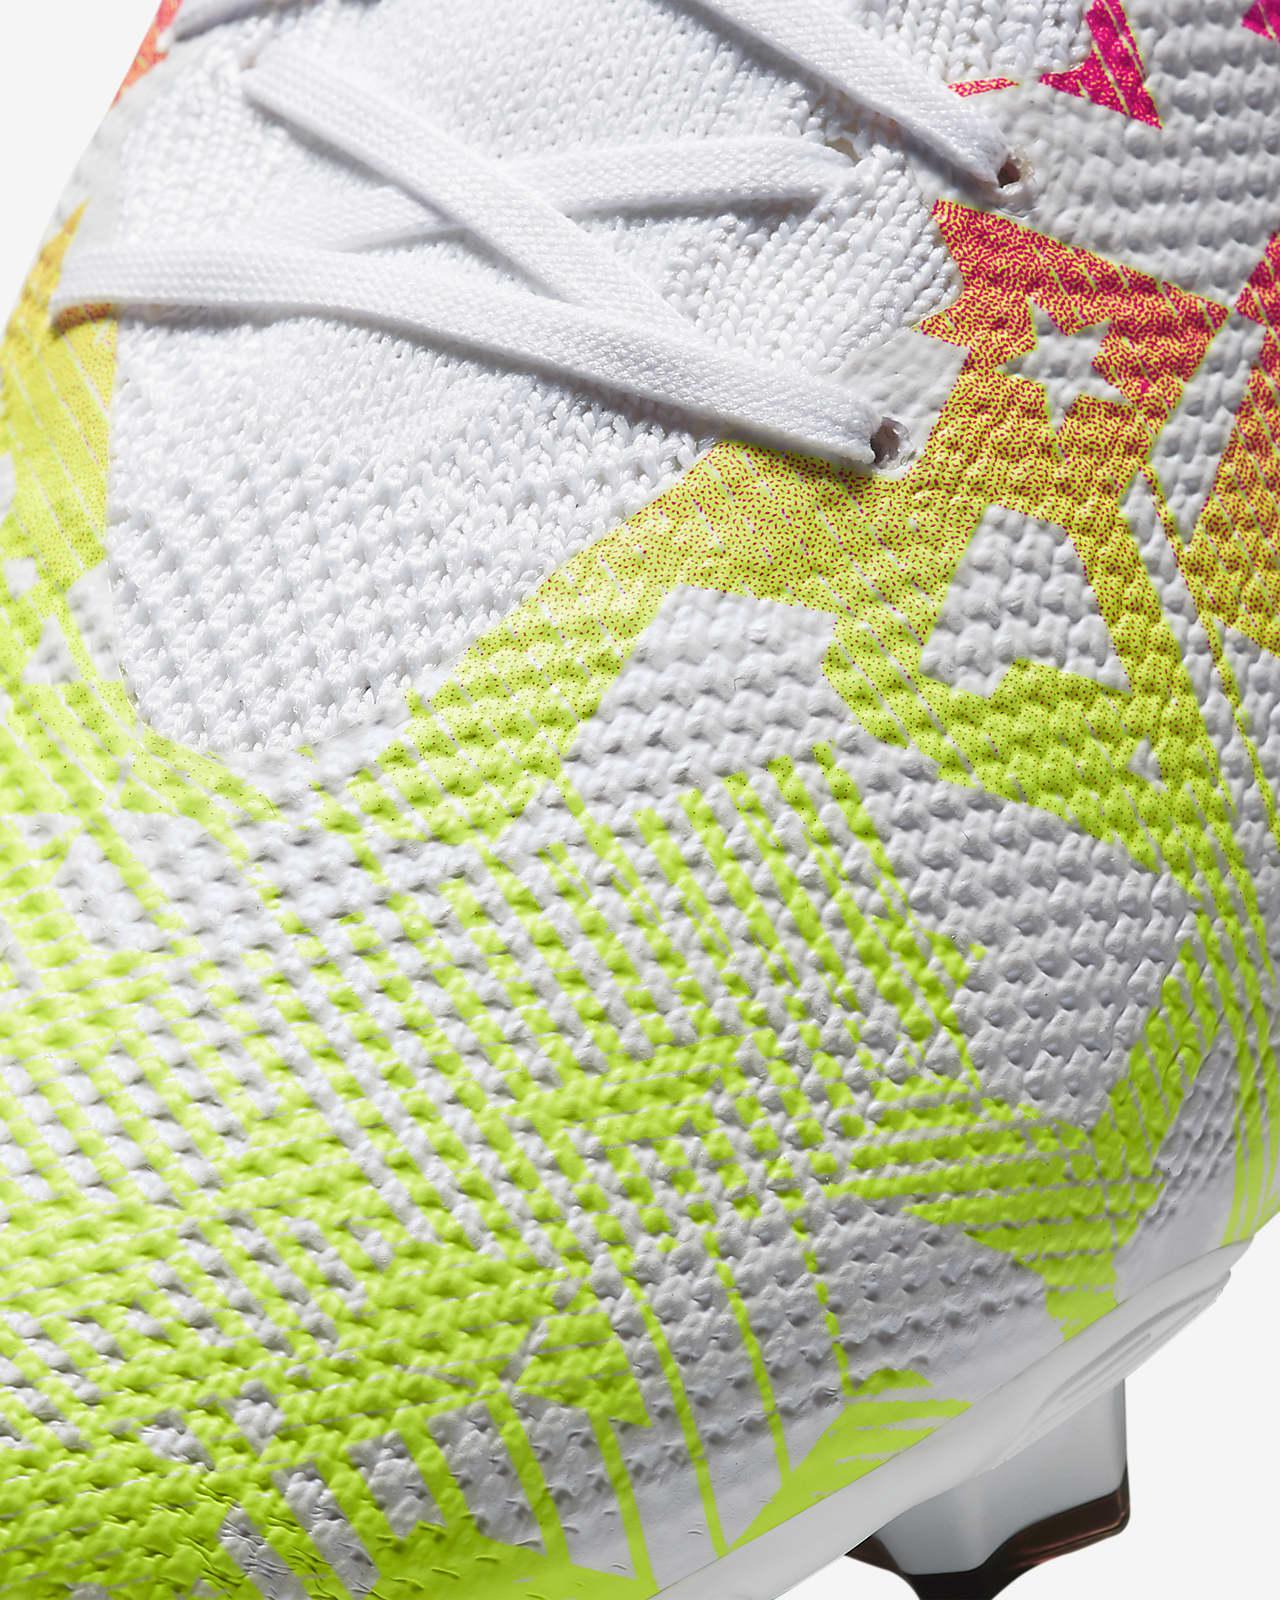 Nike Mercurial Vapor 13 Pro Neymar Jr